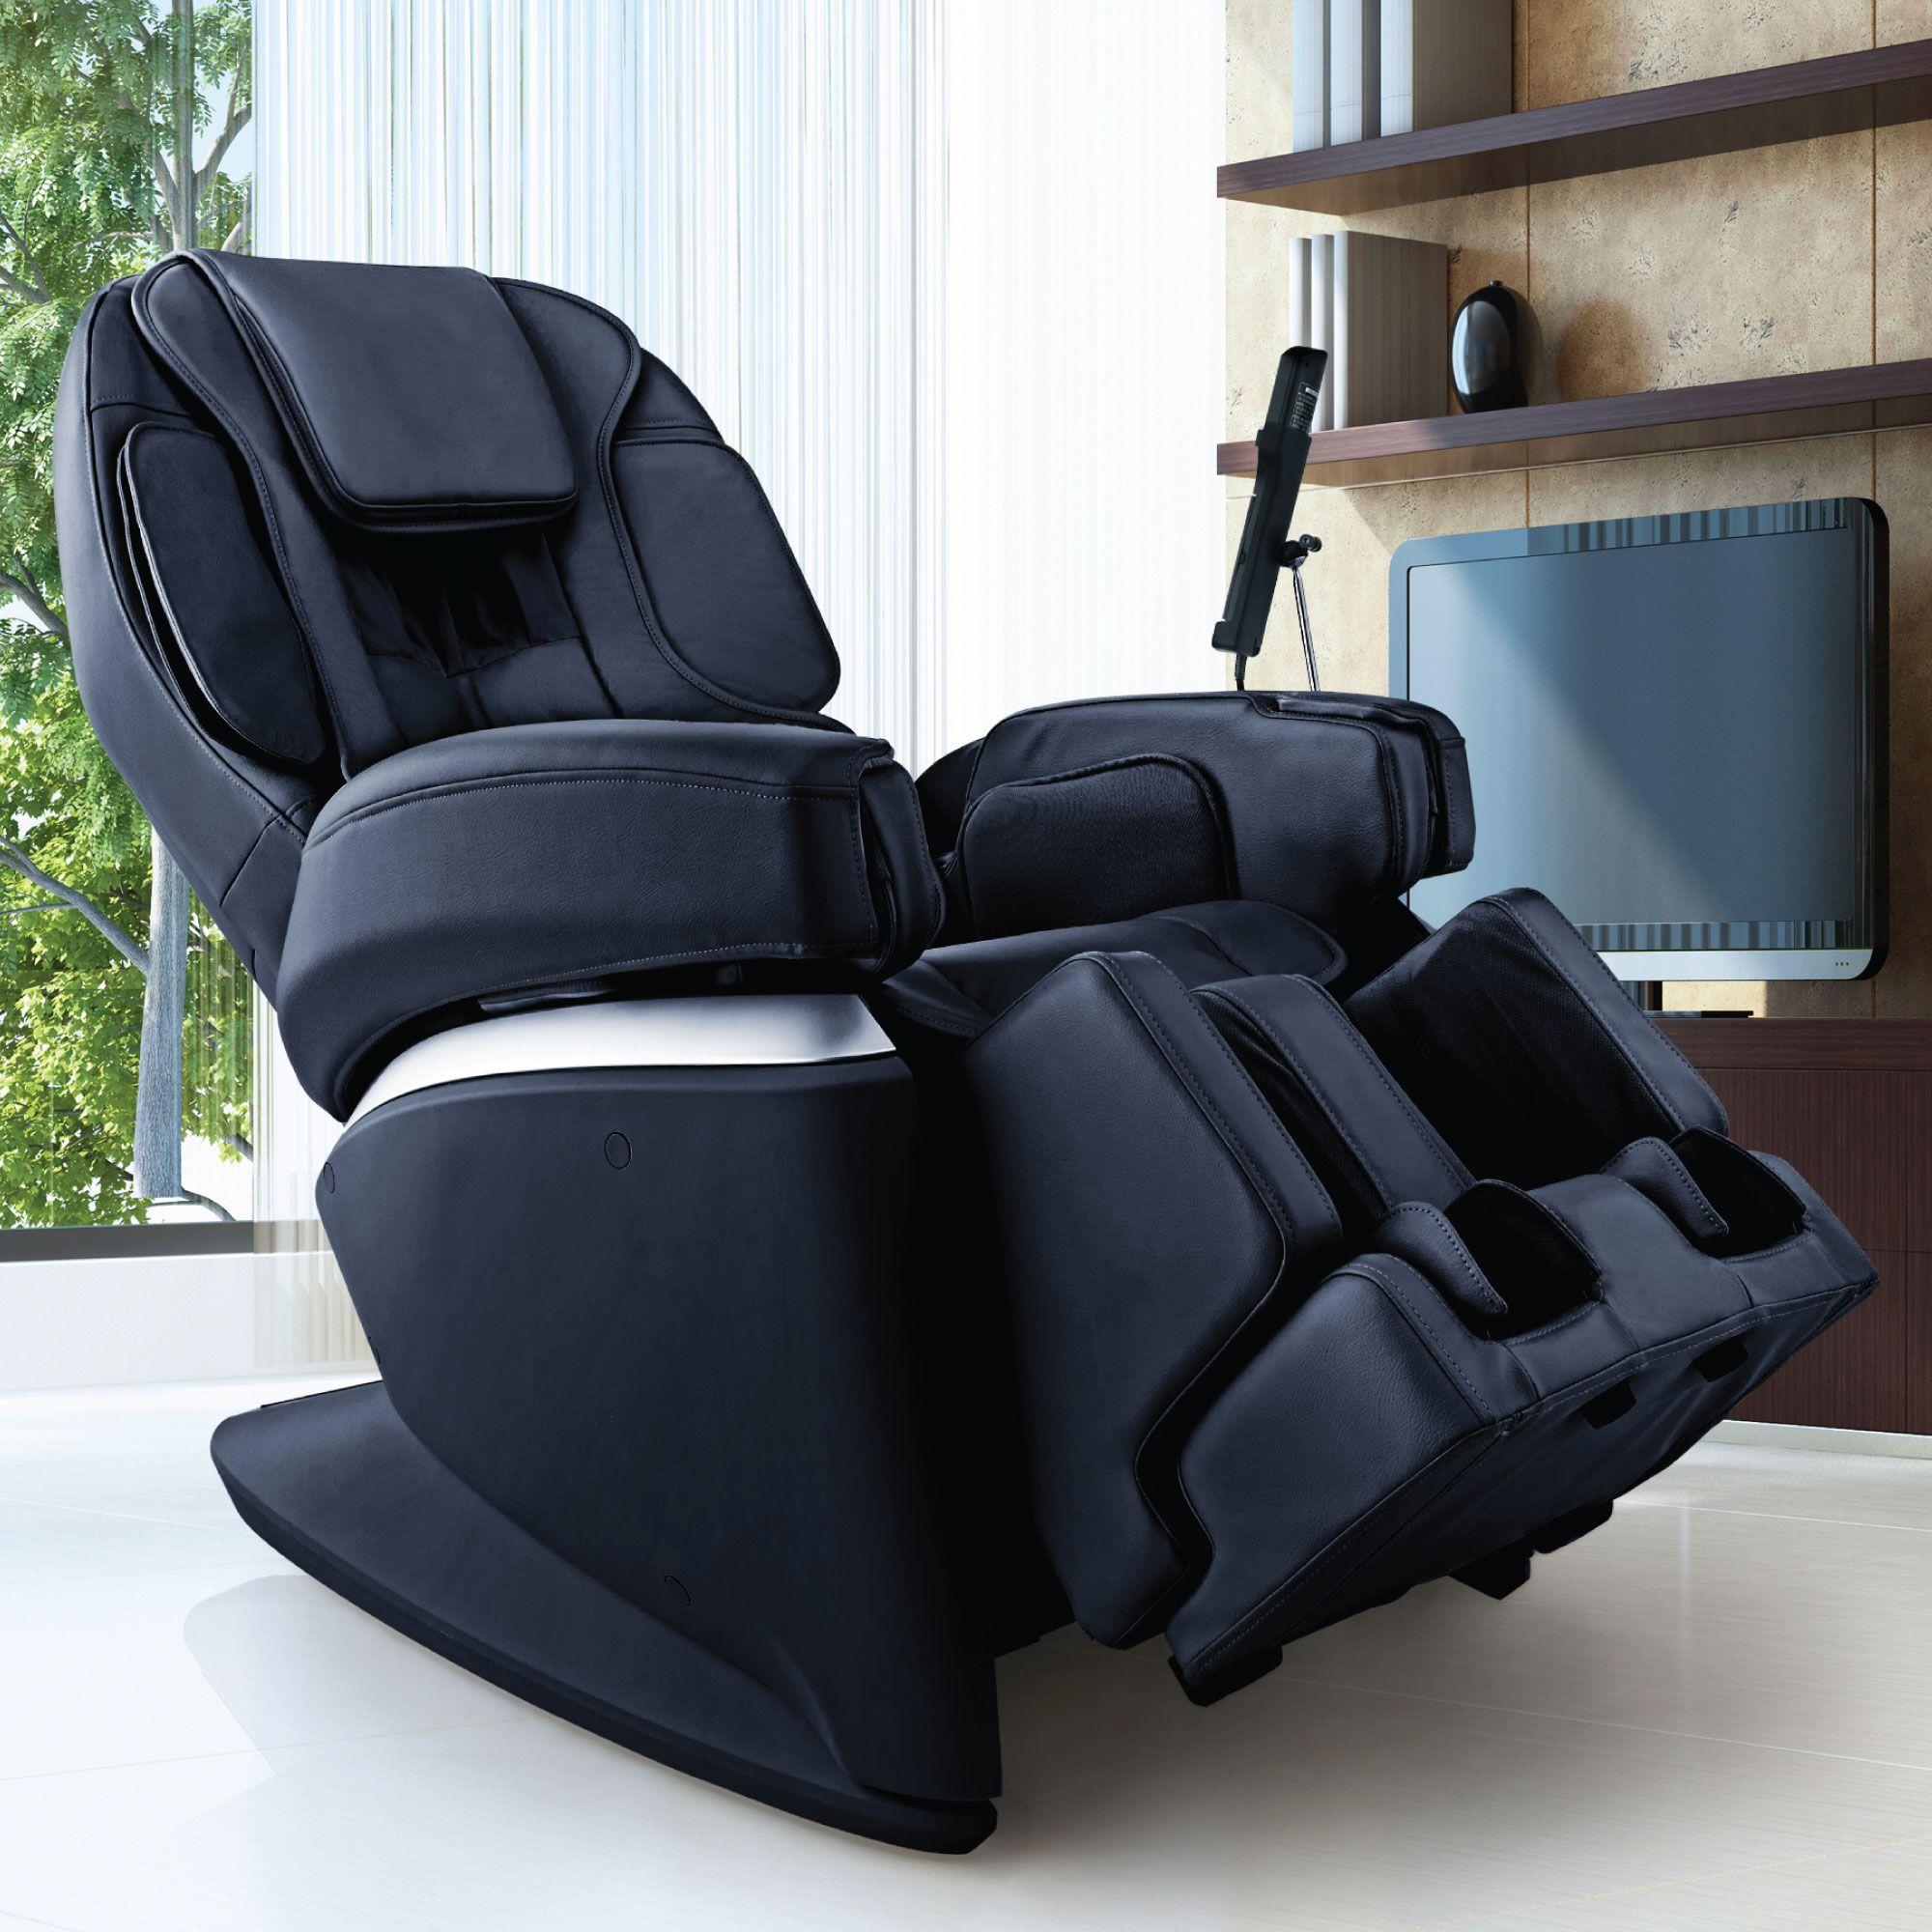 Osaki JP Premium 4 0 Japan massage chair